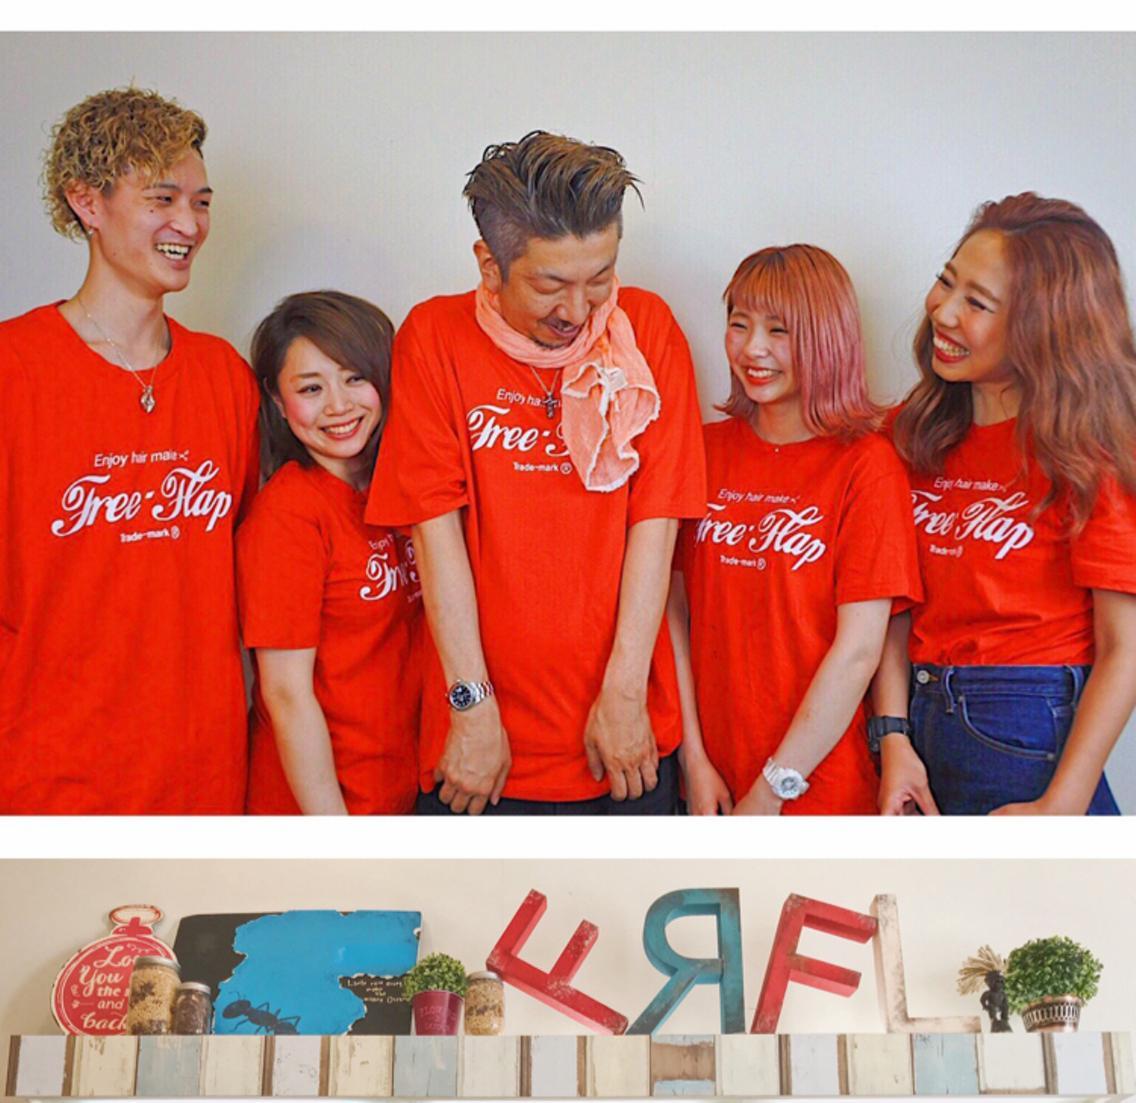 hair FACTORY FREEFLAP所属・丸井流河の掲載